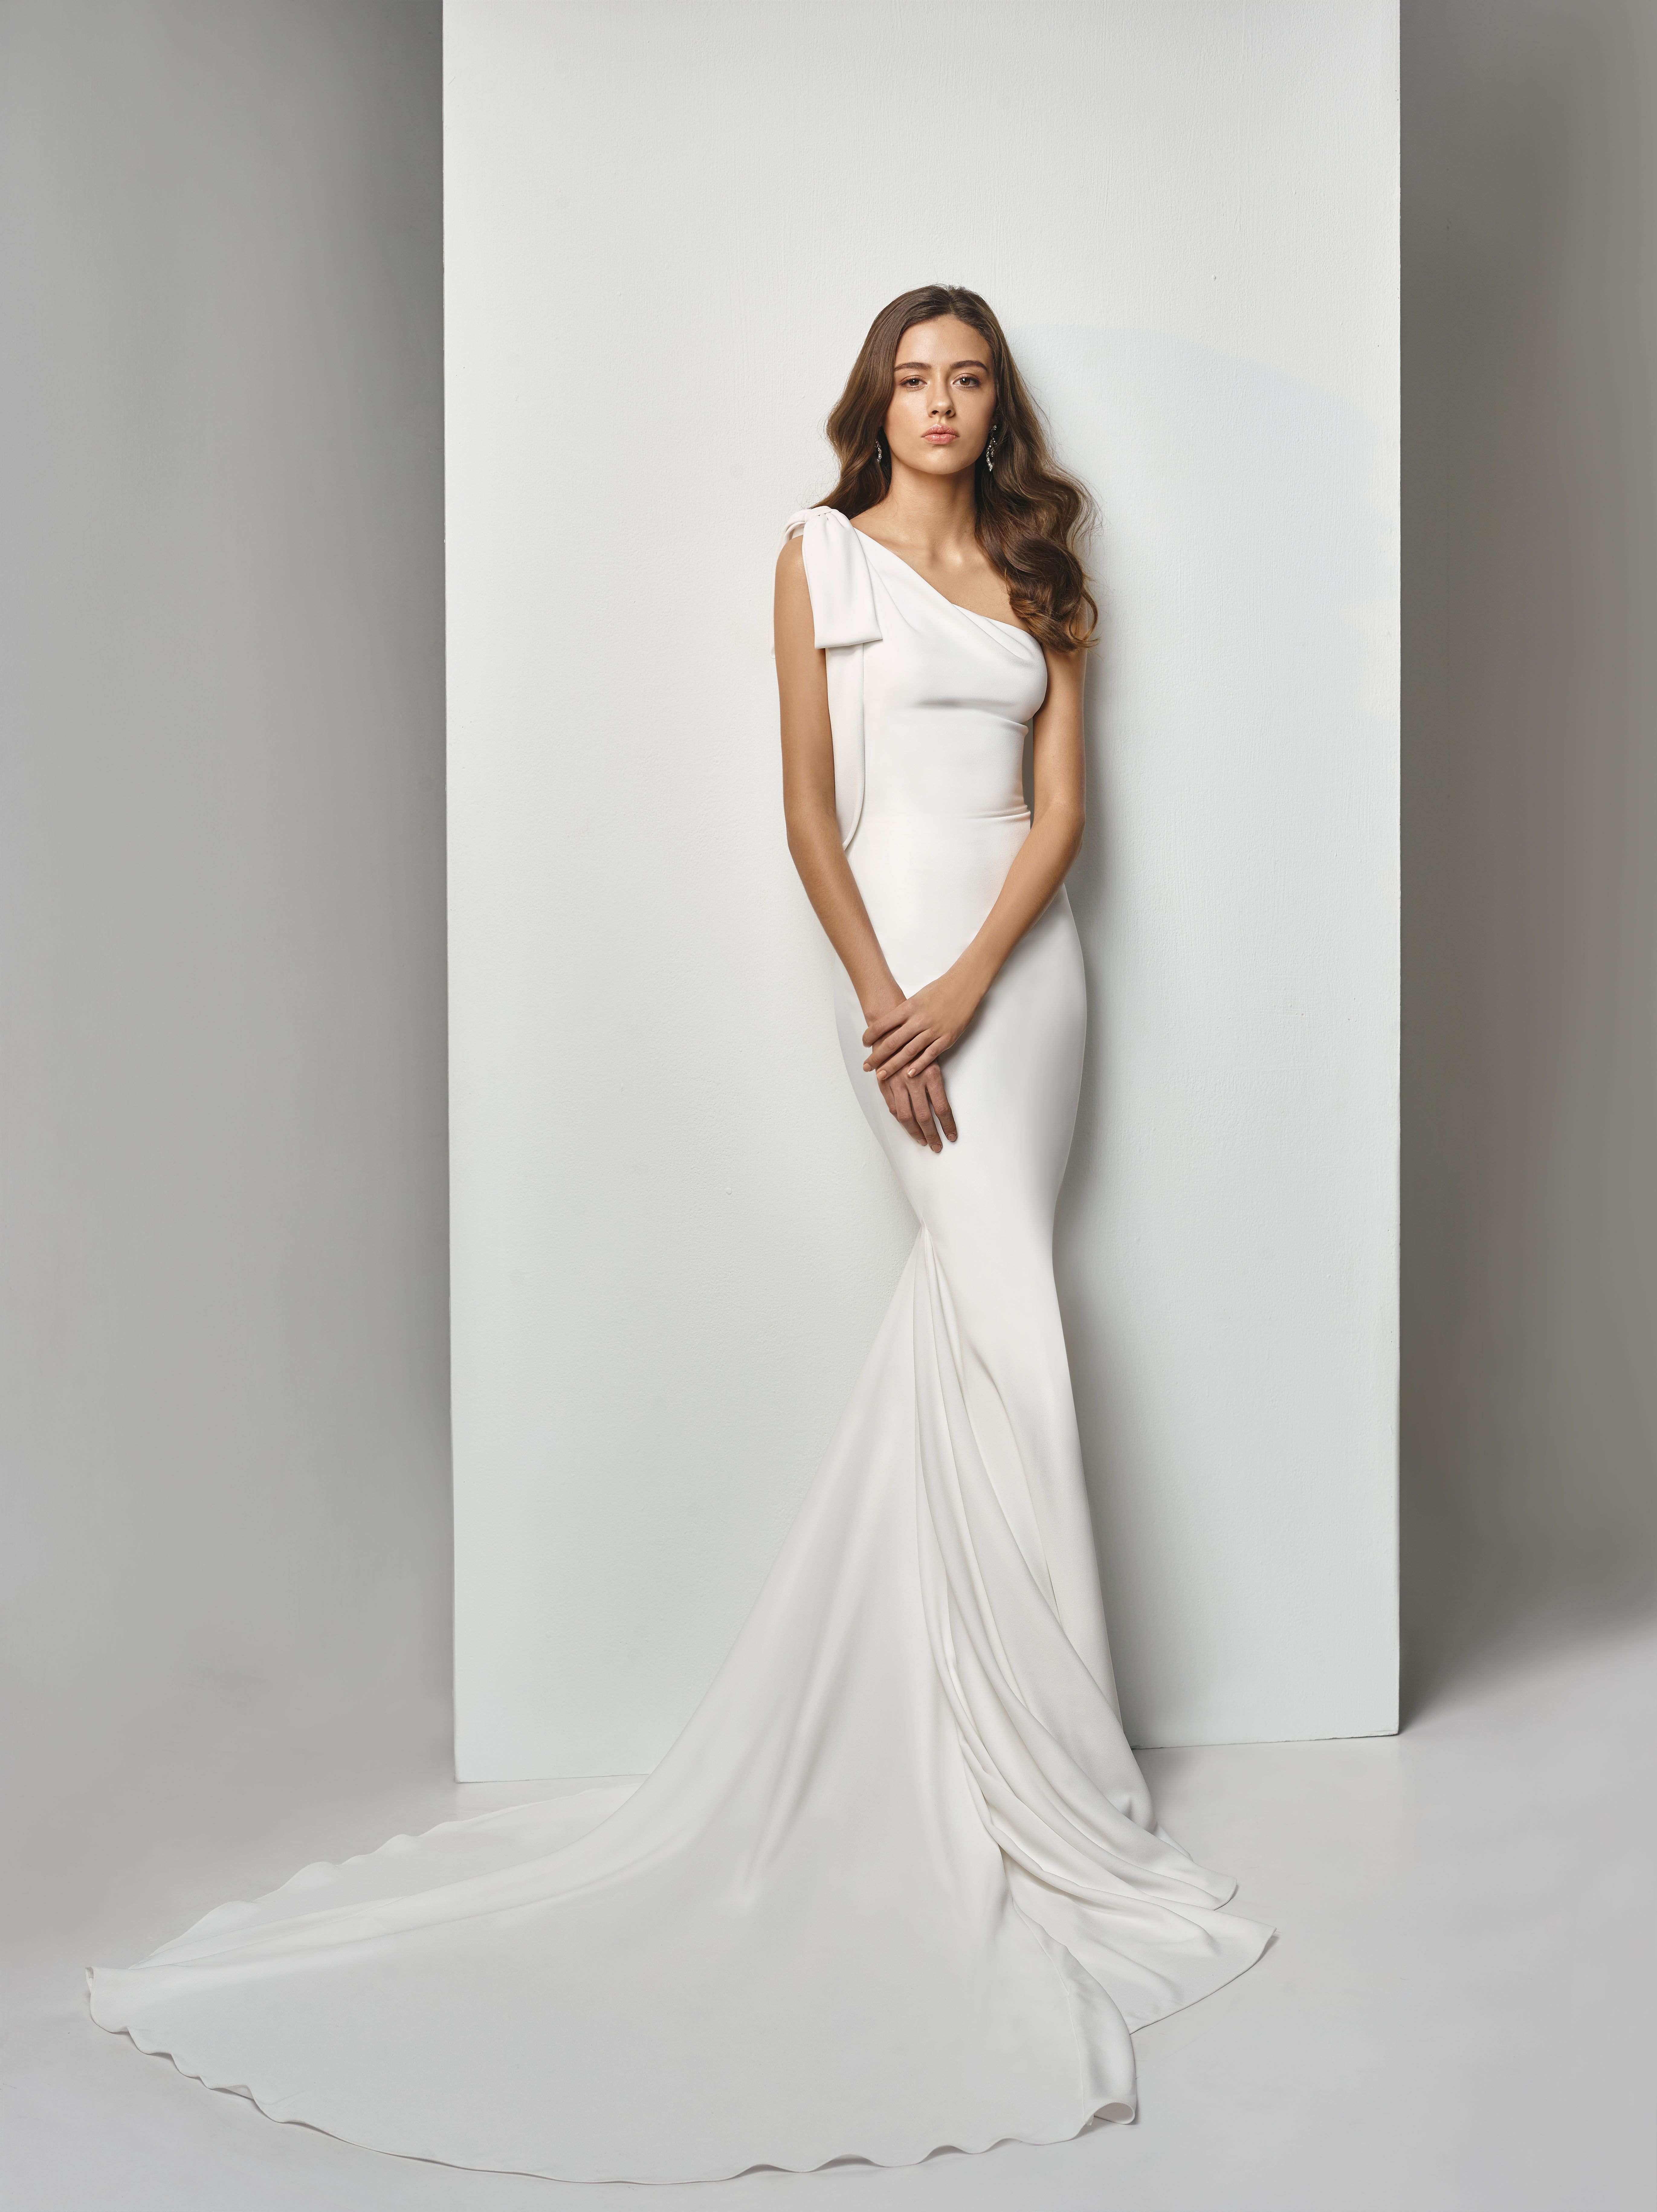 Bt19 6 Wedding Dresses Designer Wedding Dresses Bridal Dresses [ 7320 x 5484 Pixel ]